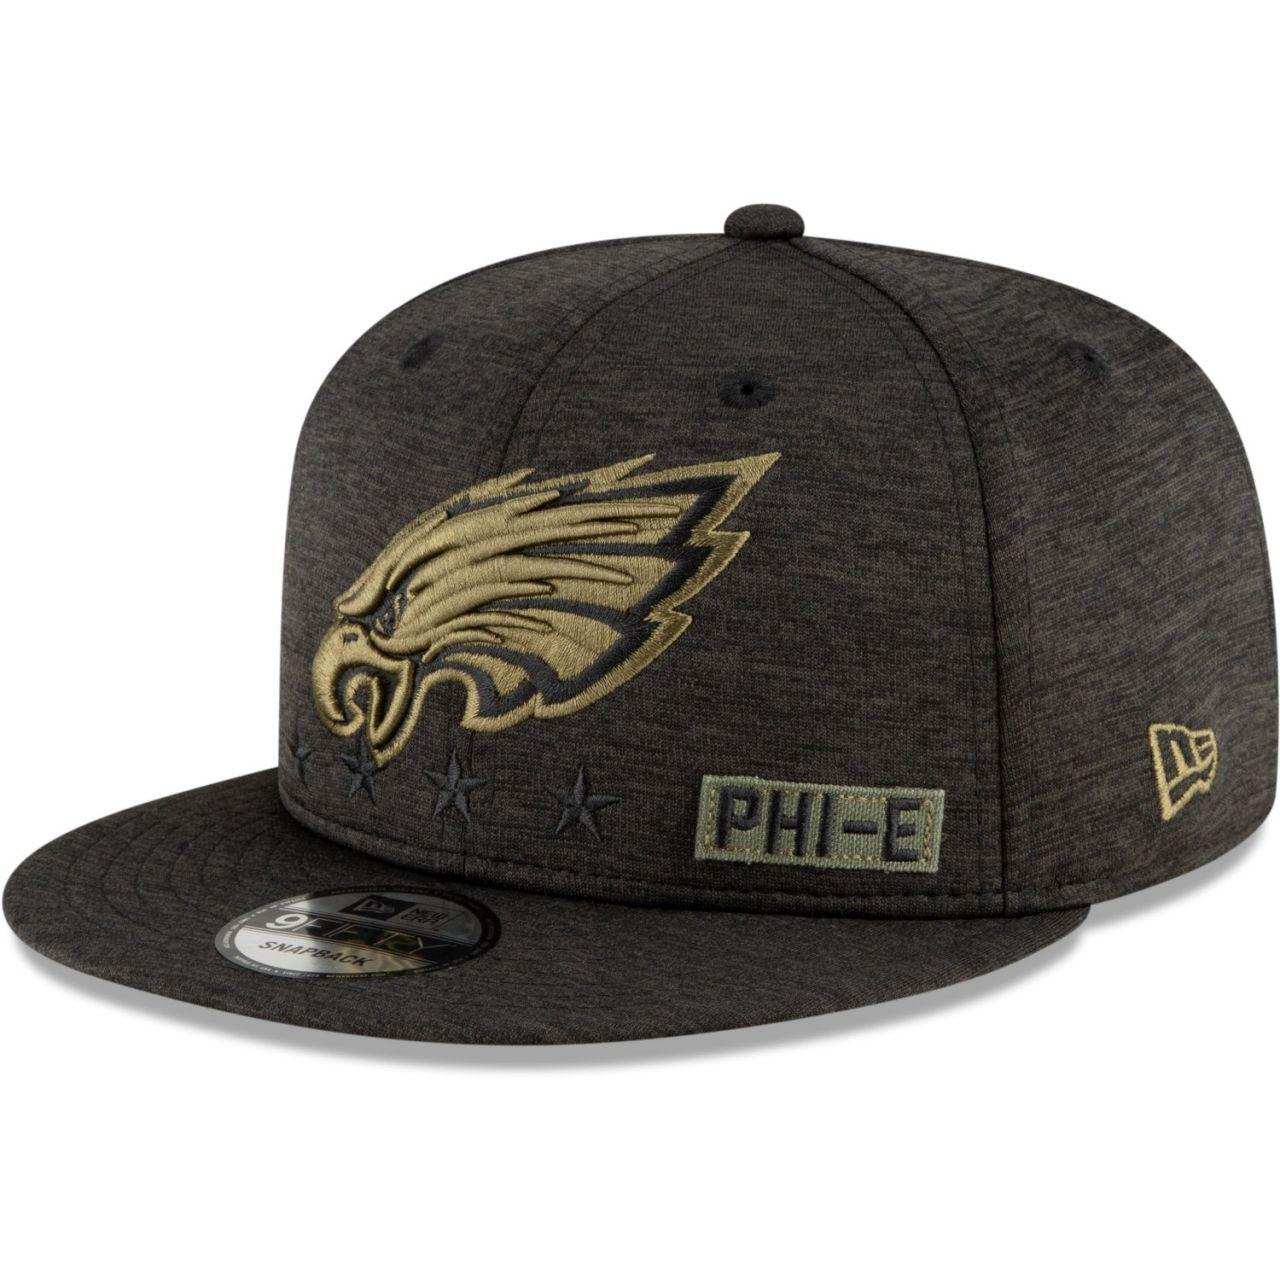 amfoo - New Era 9FIFTY Cap Salute to Service Philadelphia Eagles